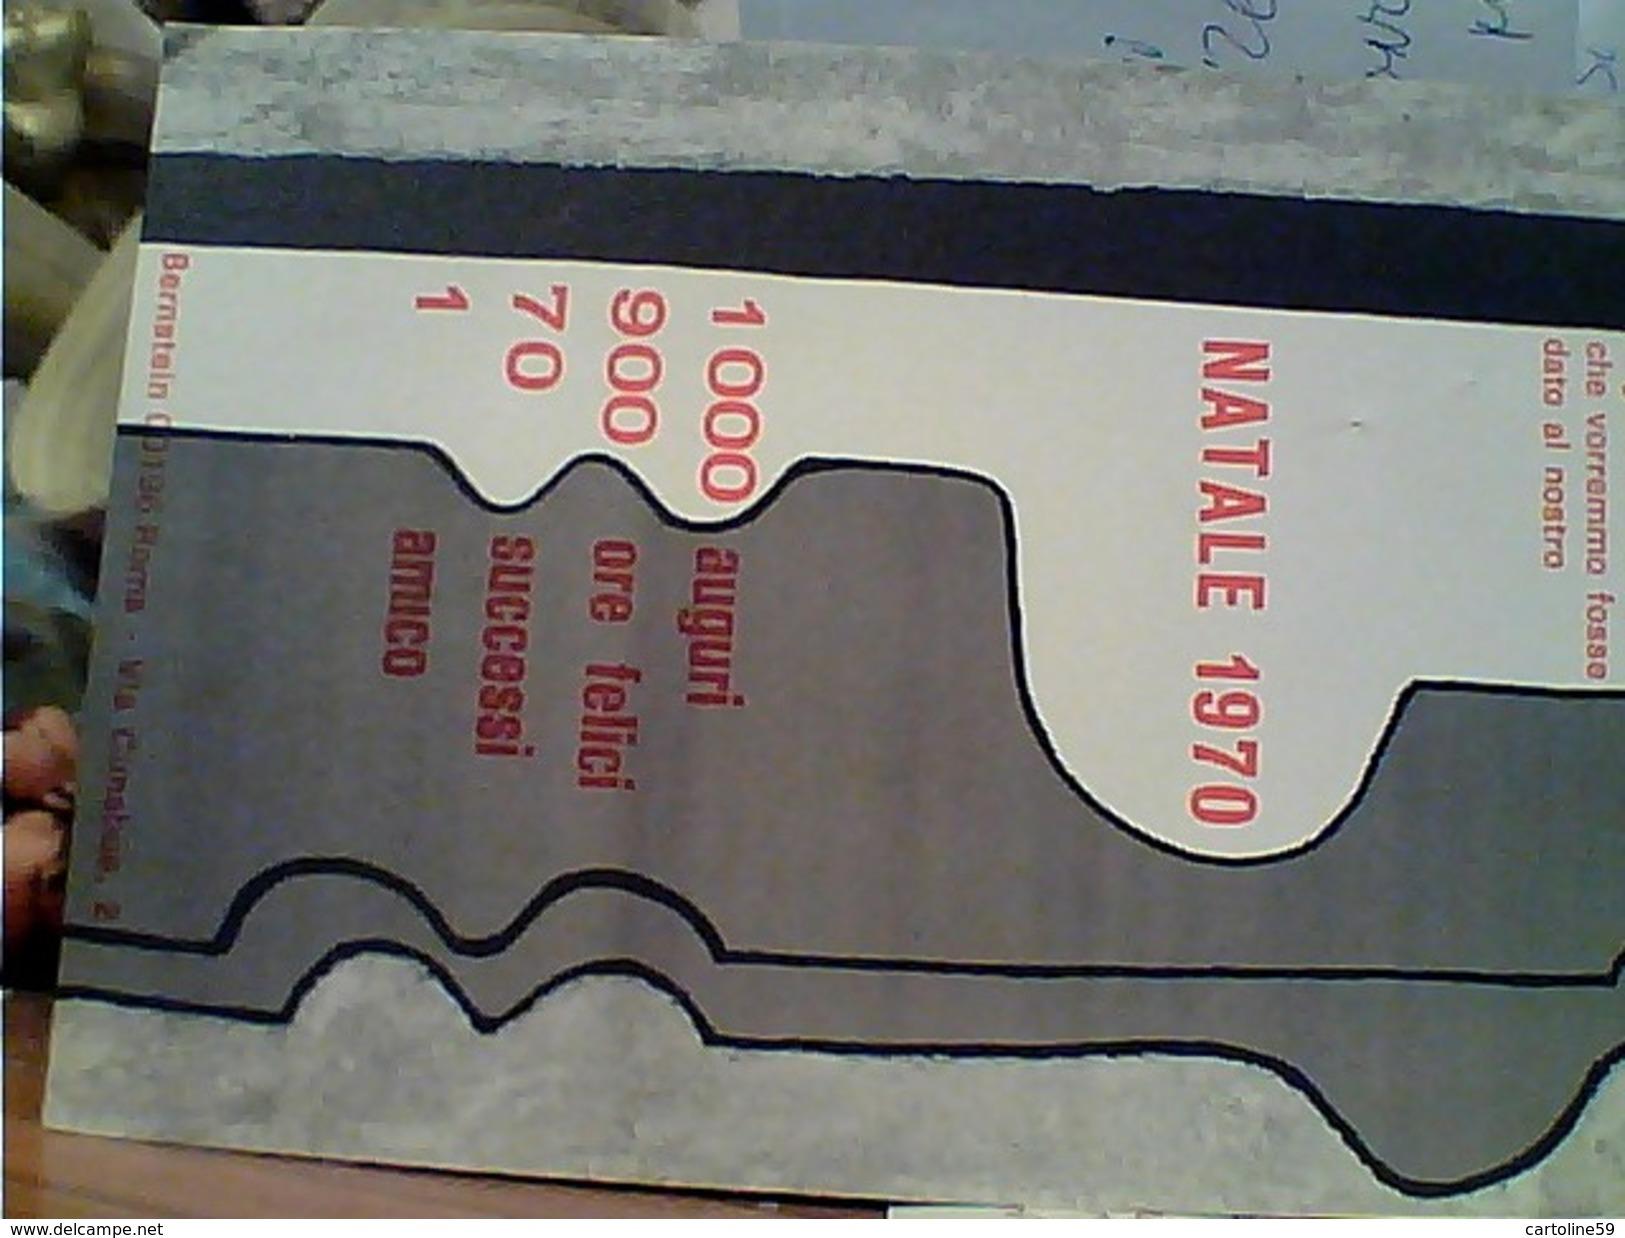 AUGURI NATALE 1970  1000 AUGURI 900 ORE FELICI 70 SUCCESSI 1 AMICO N1970  GB13421 - Natale